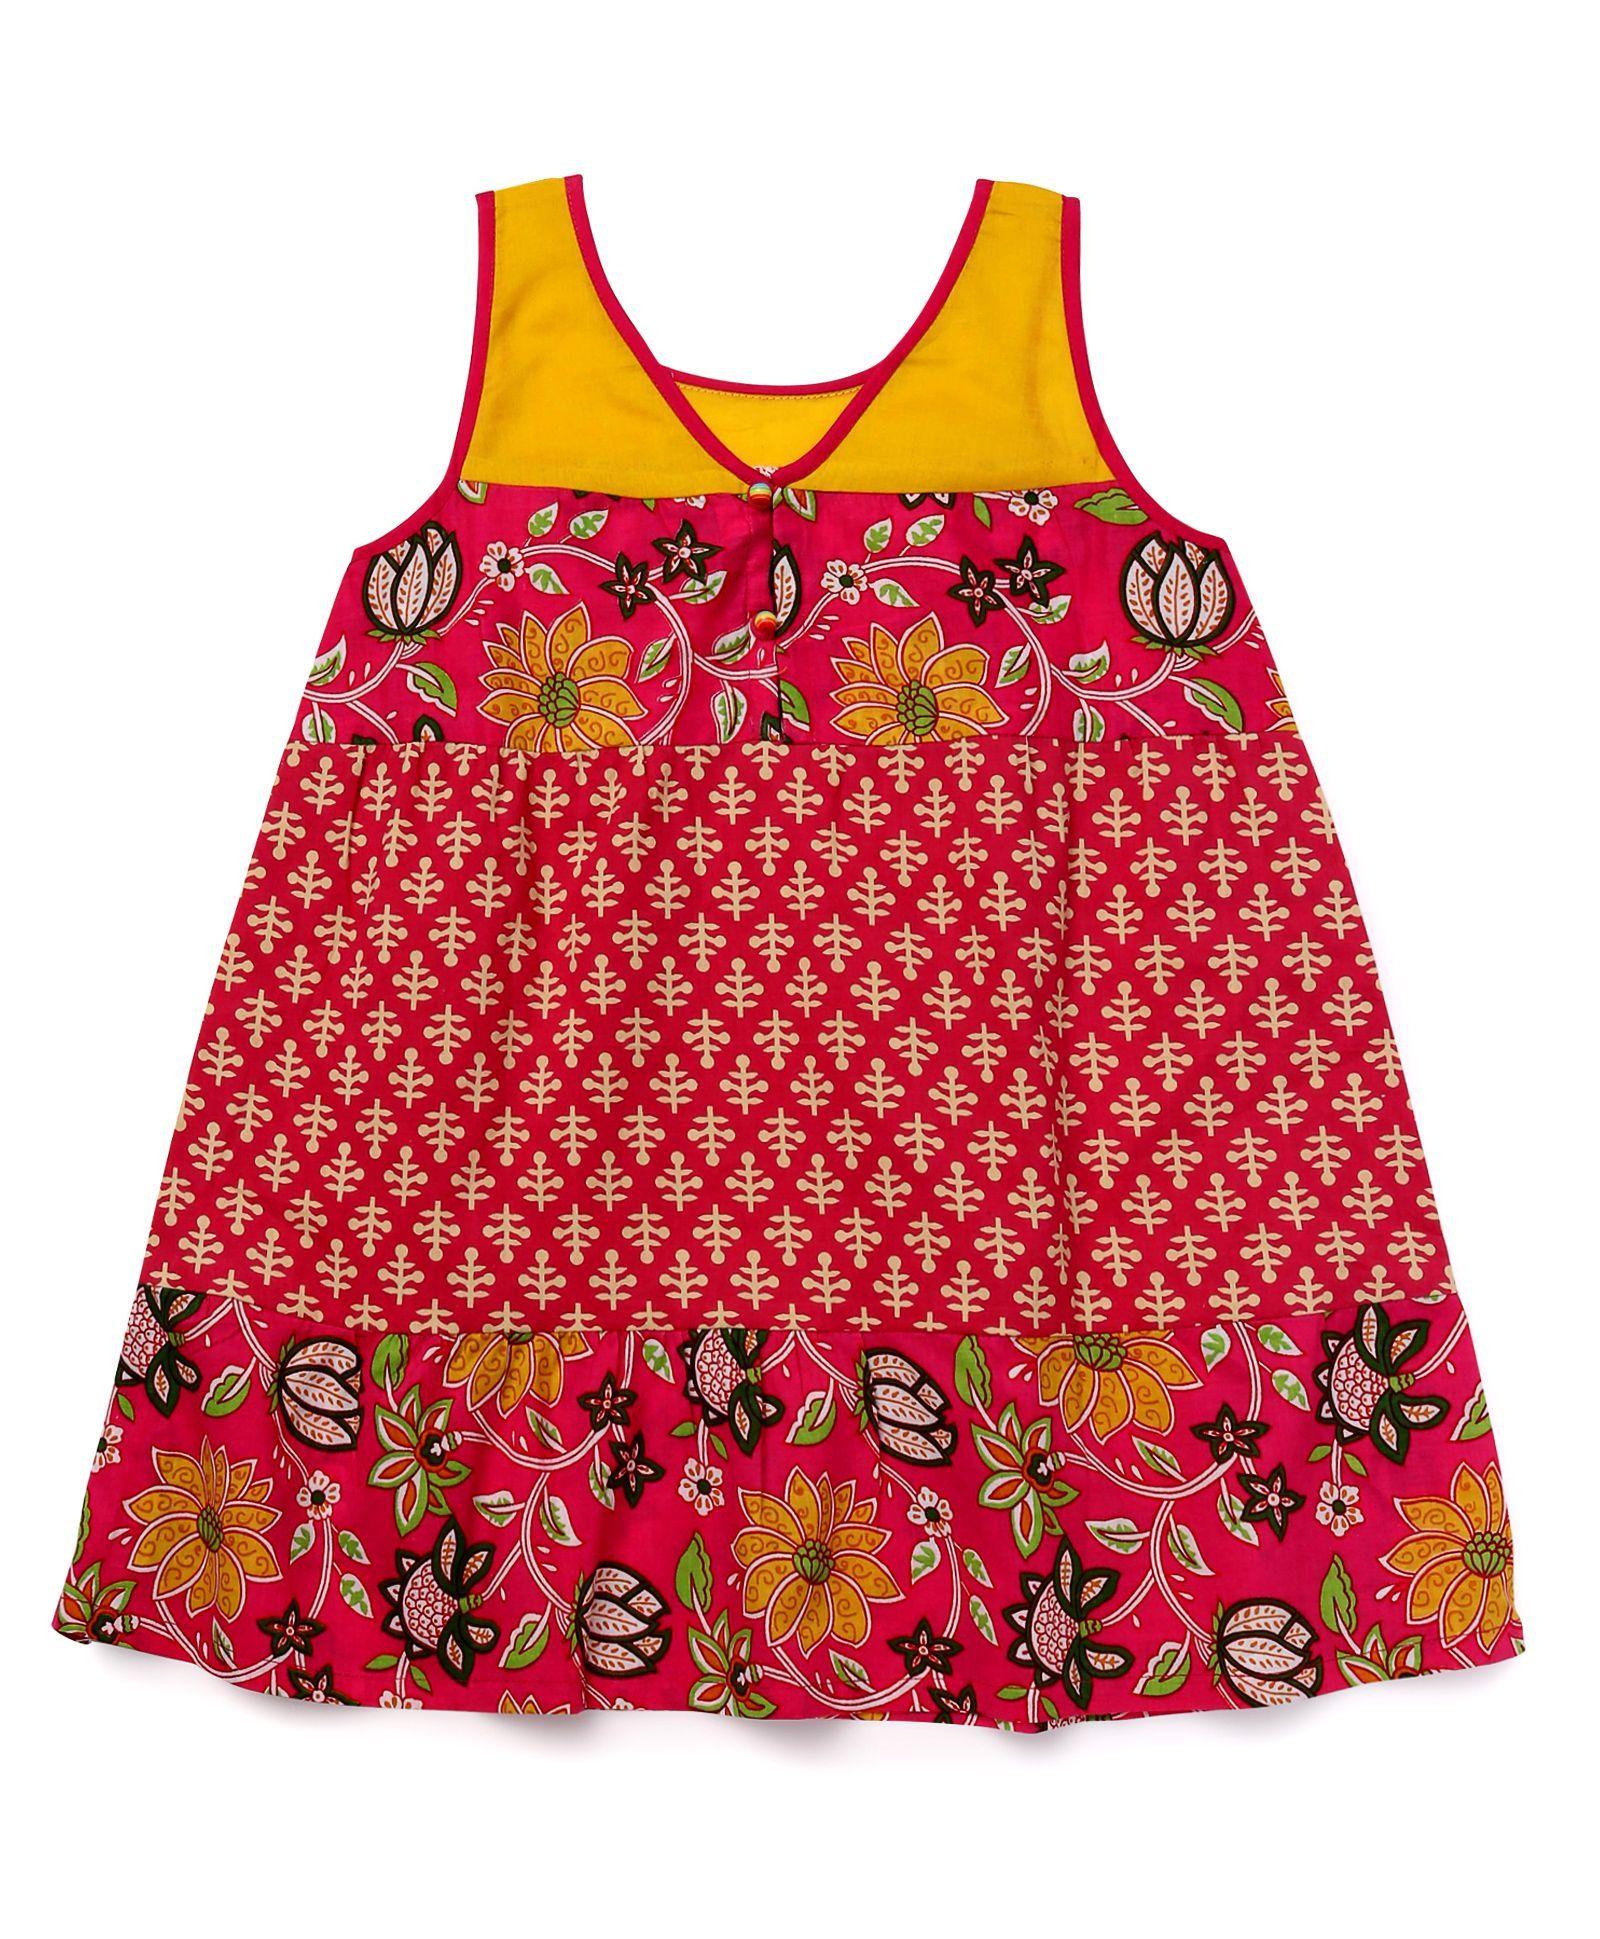 9ae623c7c7dfe Buy Alpna Kids Printed Tunic Multicolor for Girls (5-6 Years) online ...